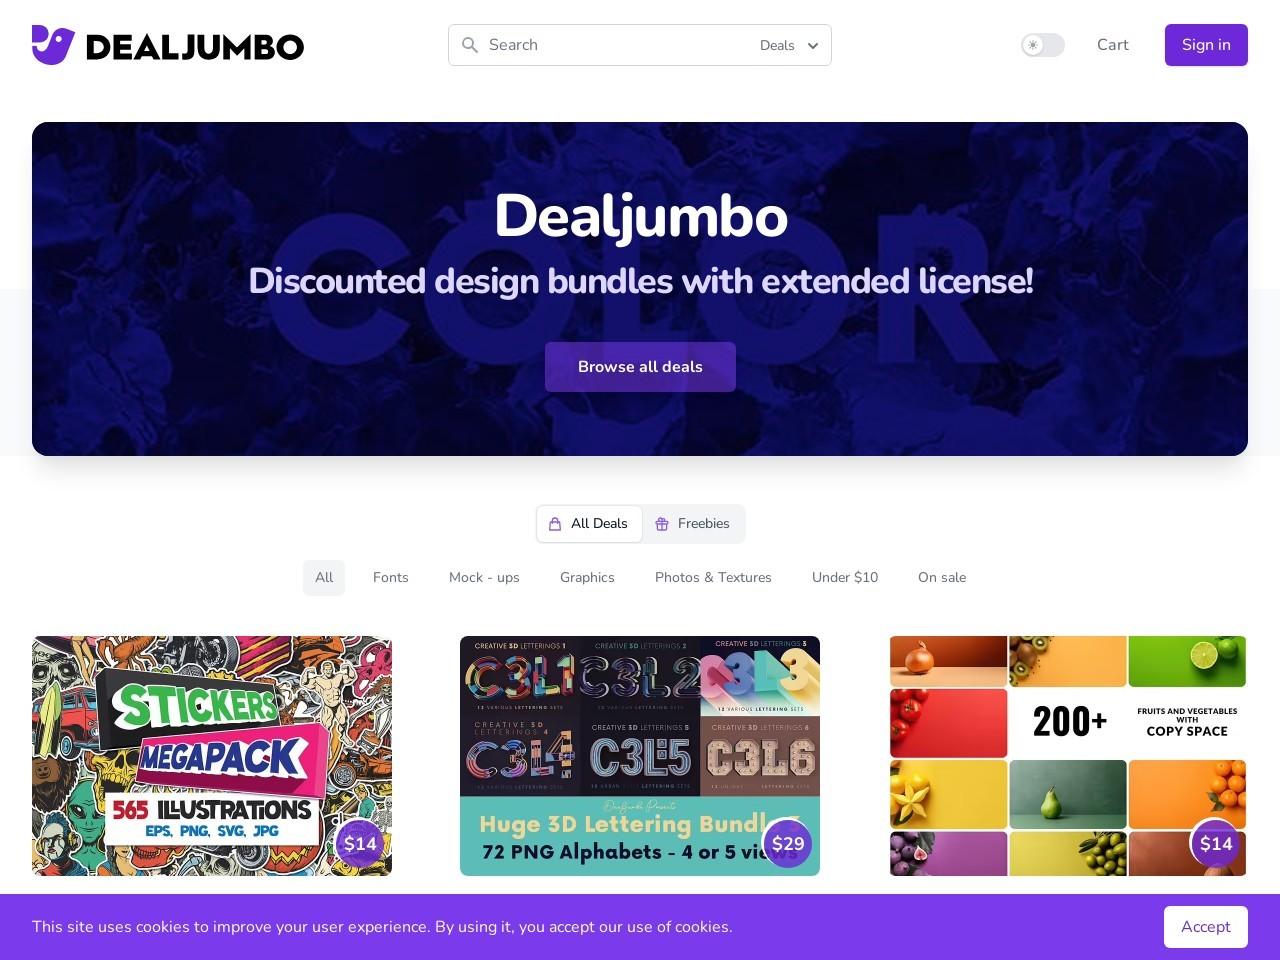 http://dealjumbo.com/ref/21/